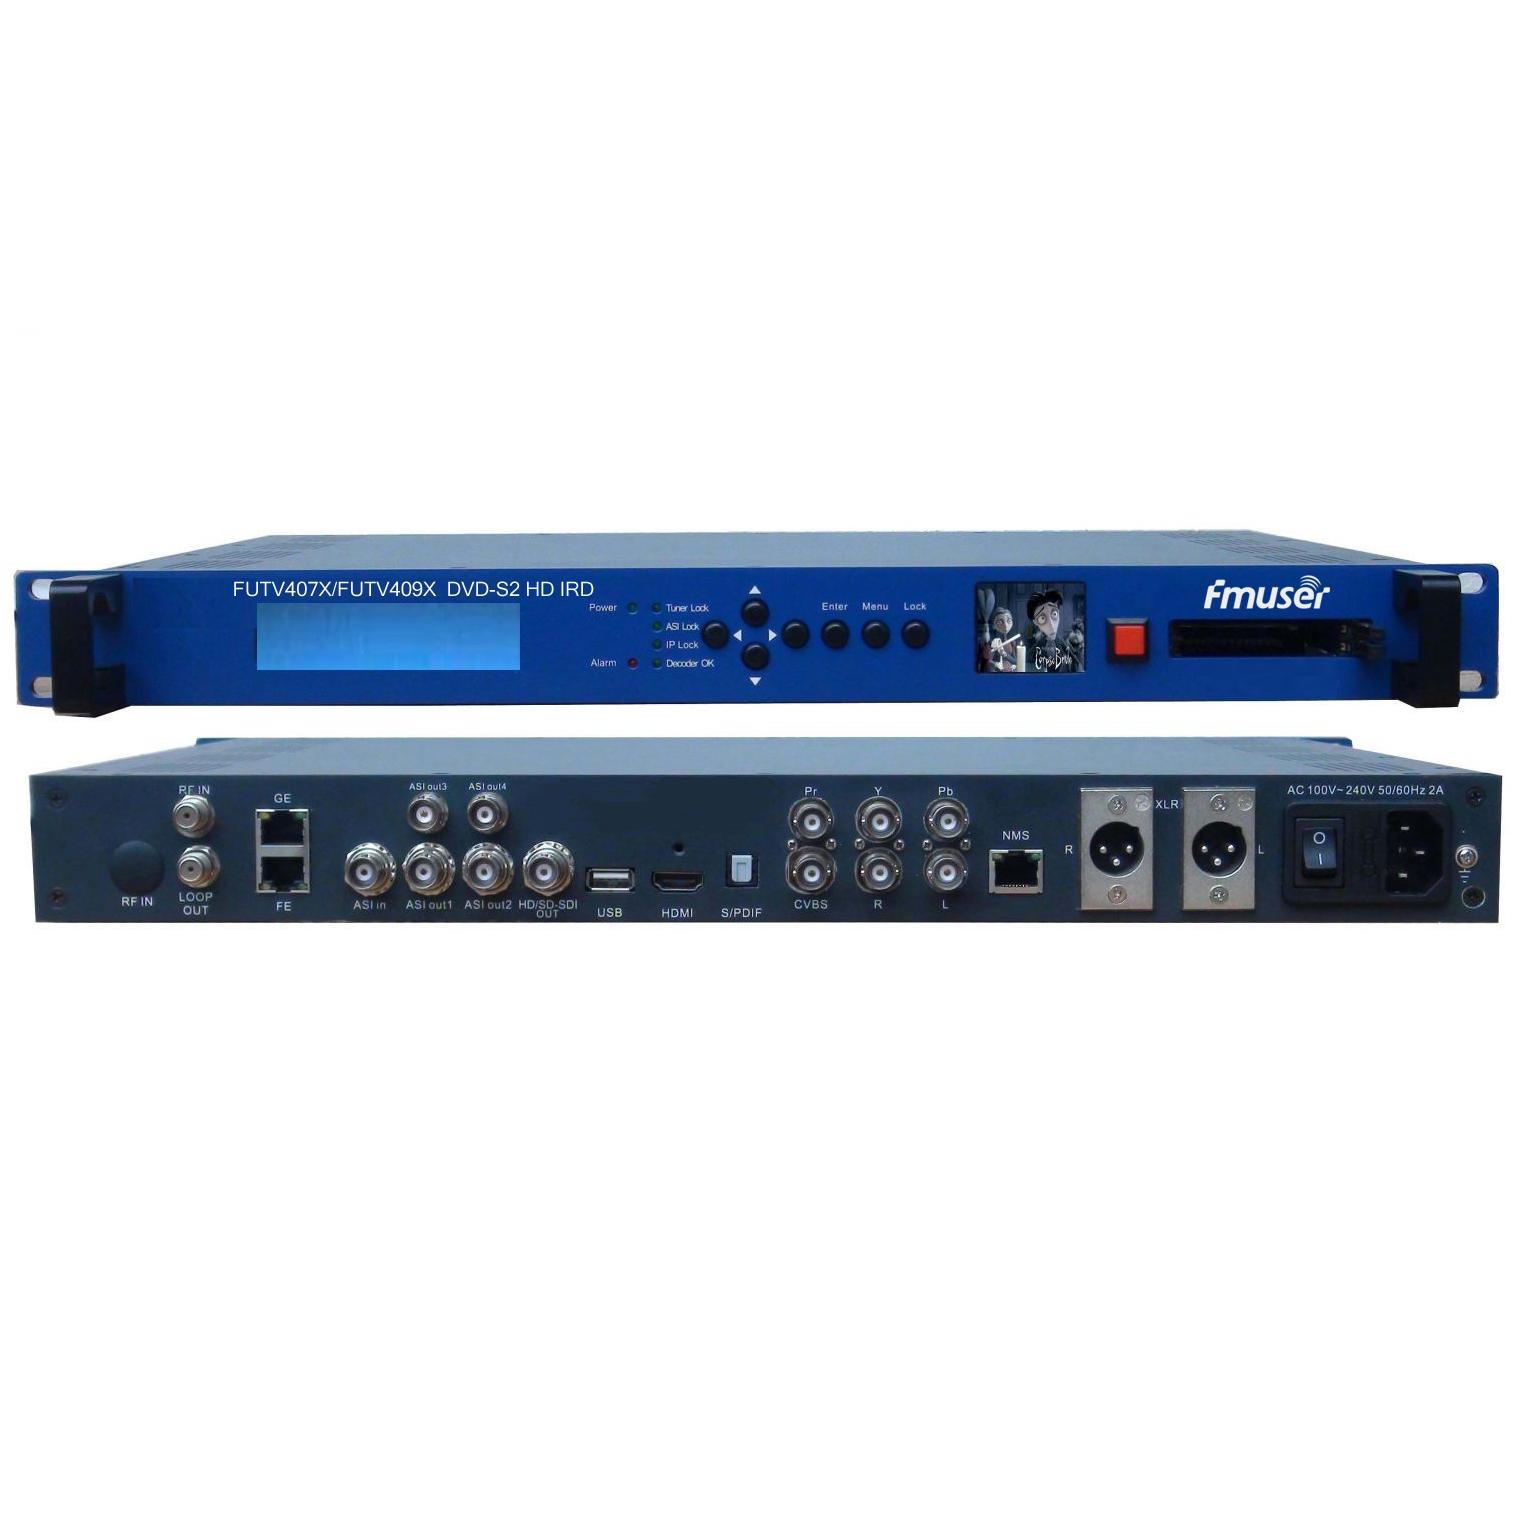 FMUSER FUTV409X / FUTV407X CAM IRD (1 DVB-C / T / S / S2, DMB-T, ISDB-T, ATSC-T 8VSB RF Input, 1 ASI IP In, 2 ASI 1 IP Output, HDMI SDI CVBS XLR) con pantalla en vivo